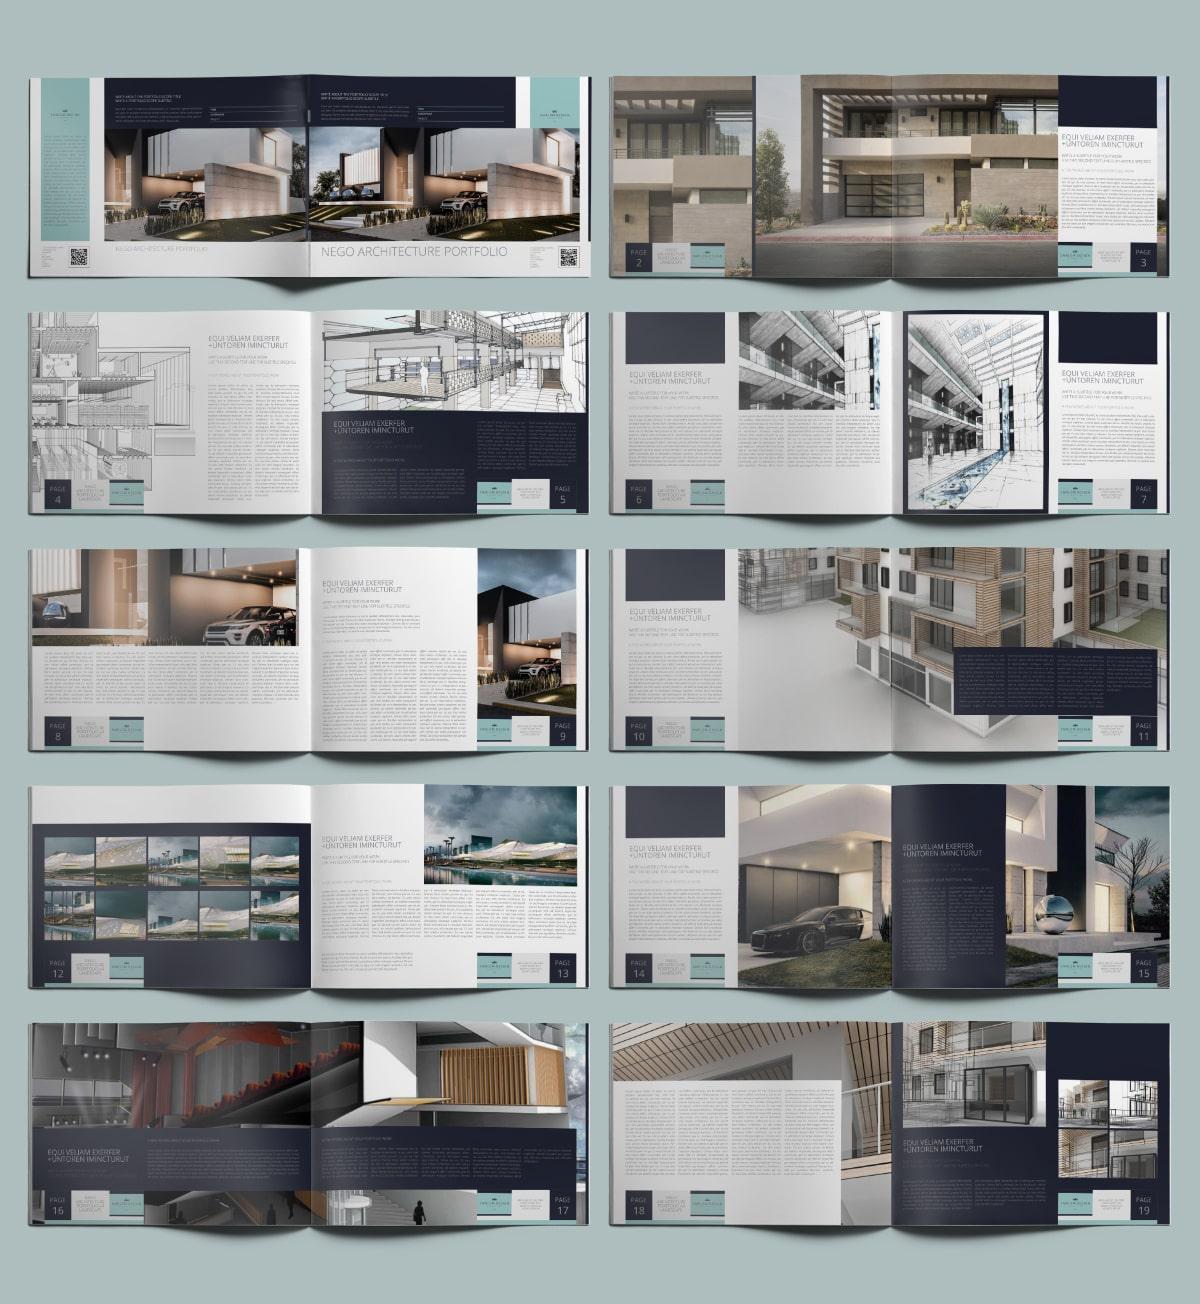 Nego Architecture Portfolio A4 Landscape - Layouts